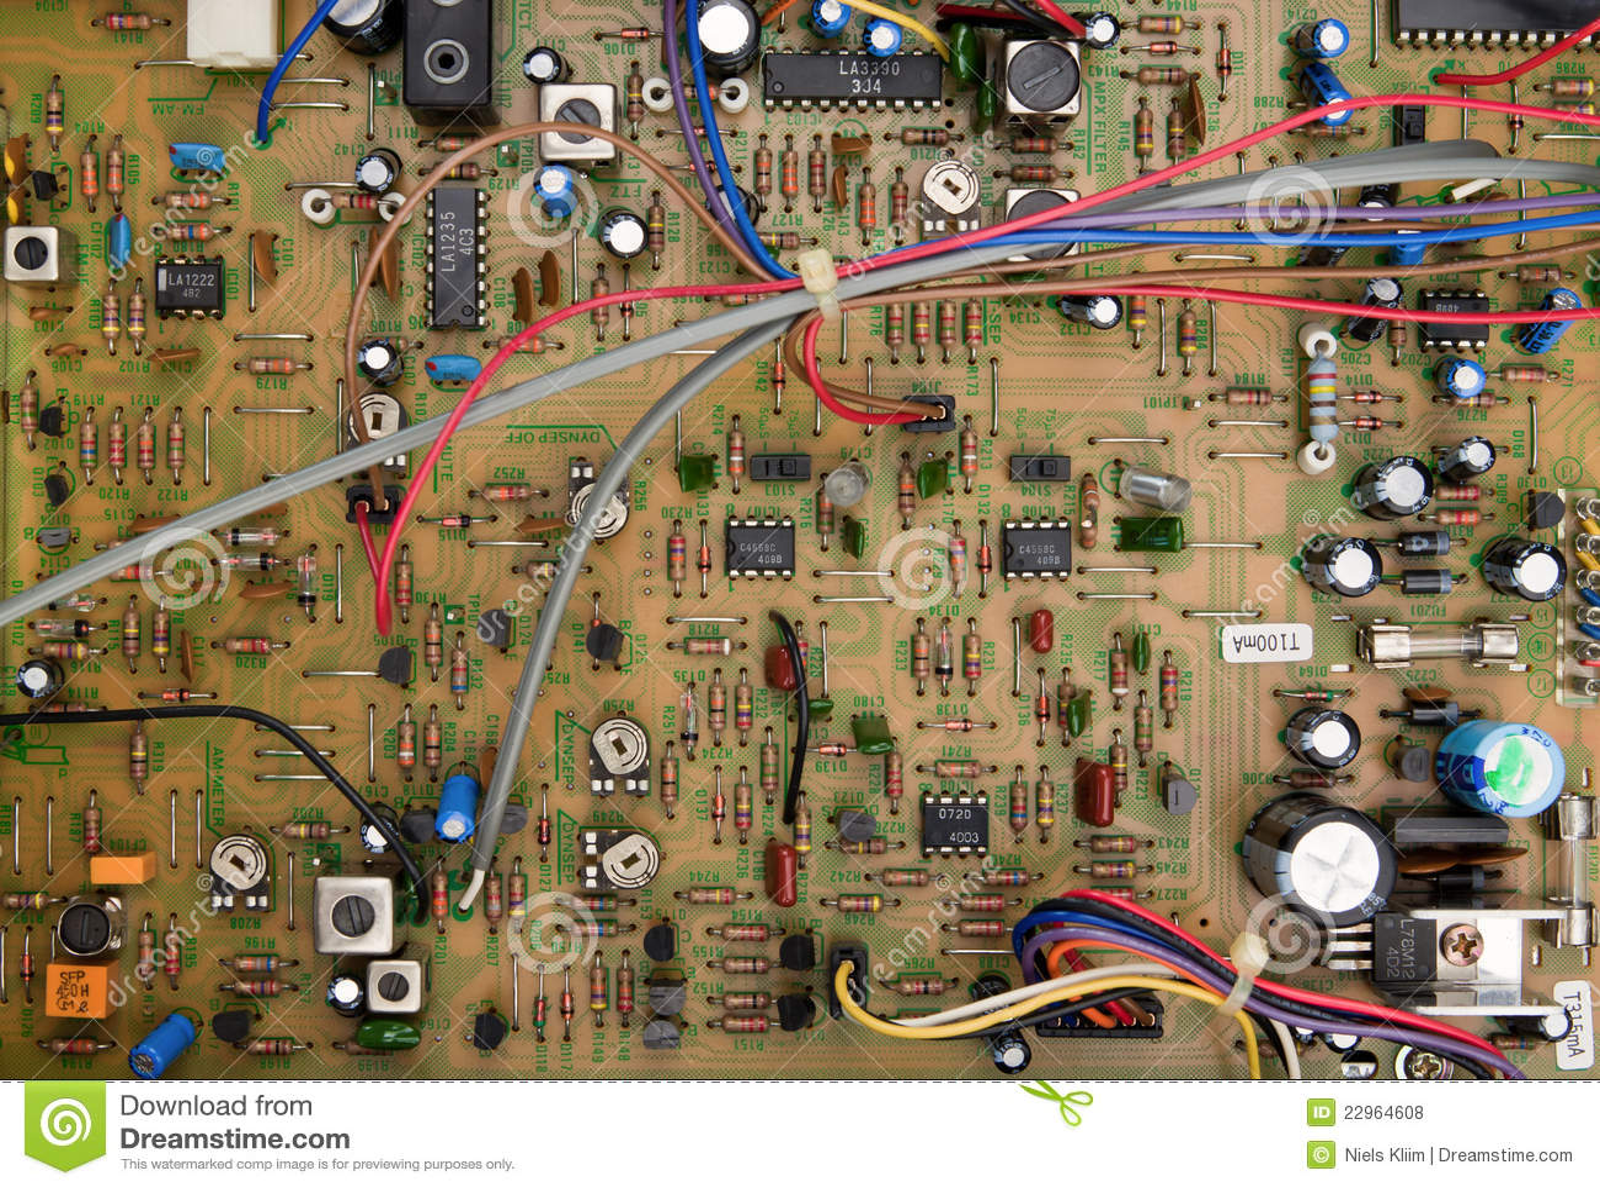 Jpg Parallel Circuit Example Phet Simulator